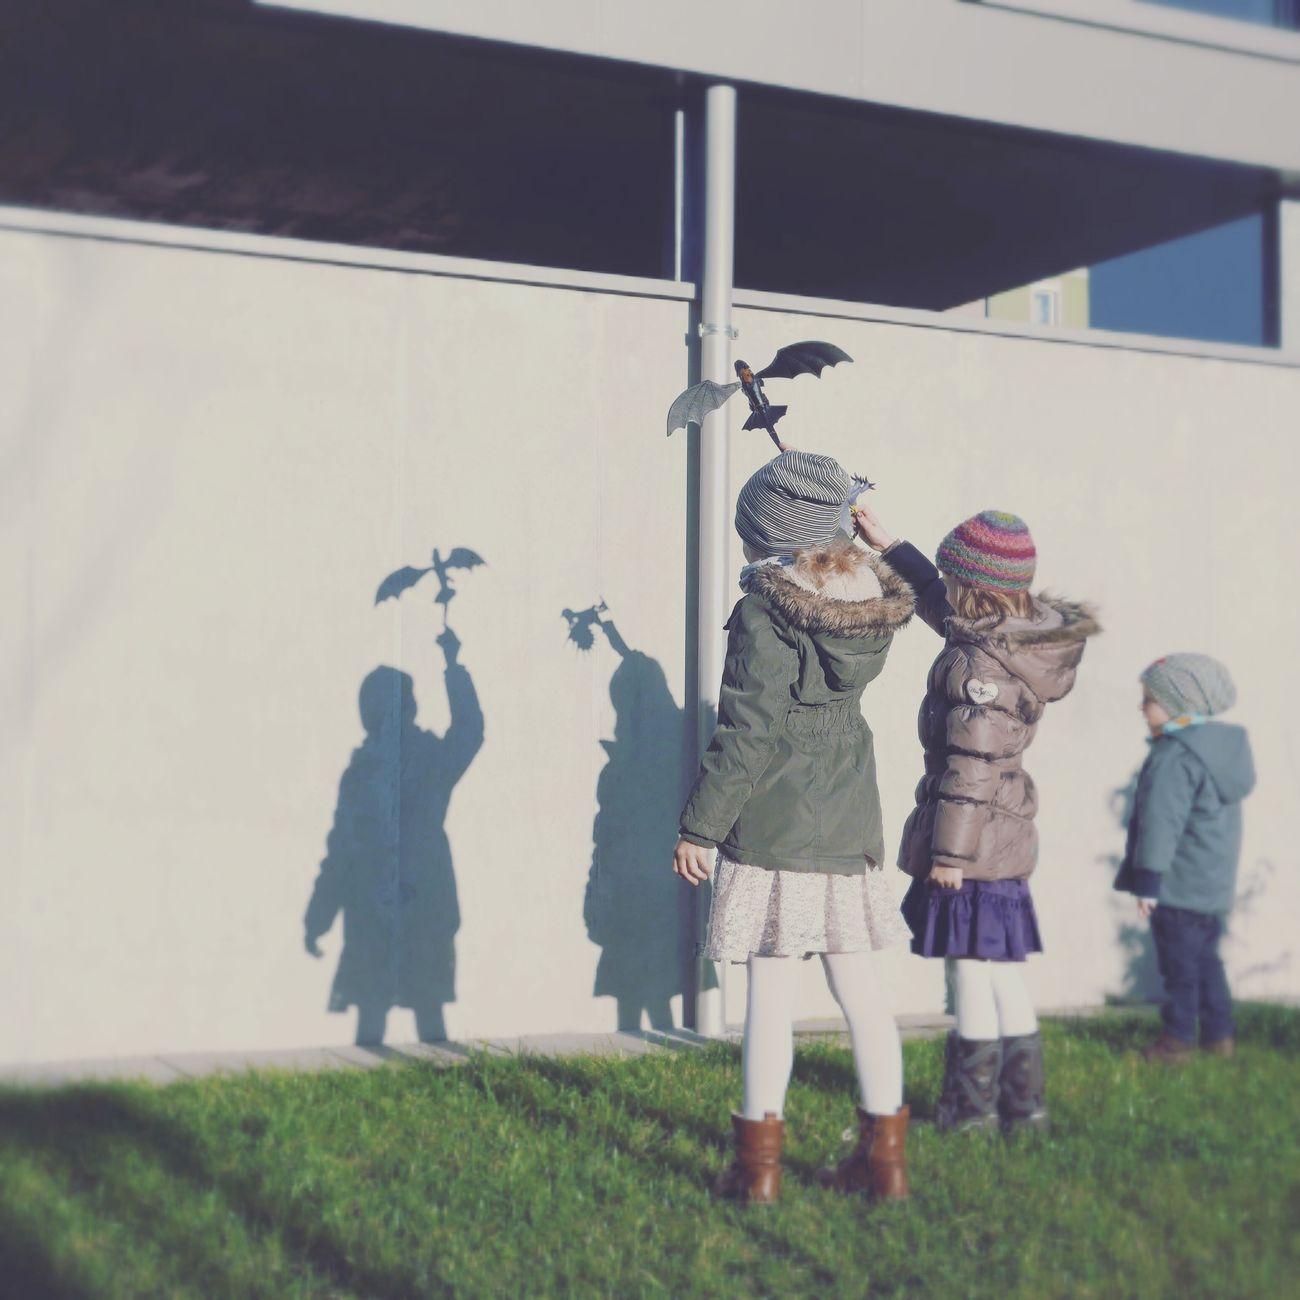 Kids Playing Kids Fantasy Playing Light And Shadow Urban Life